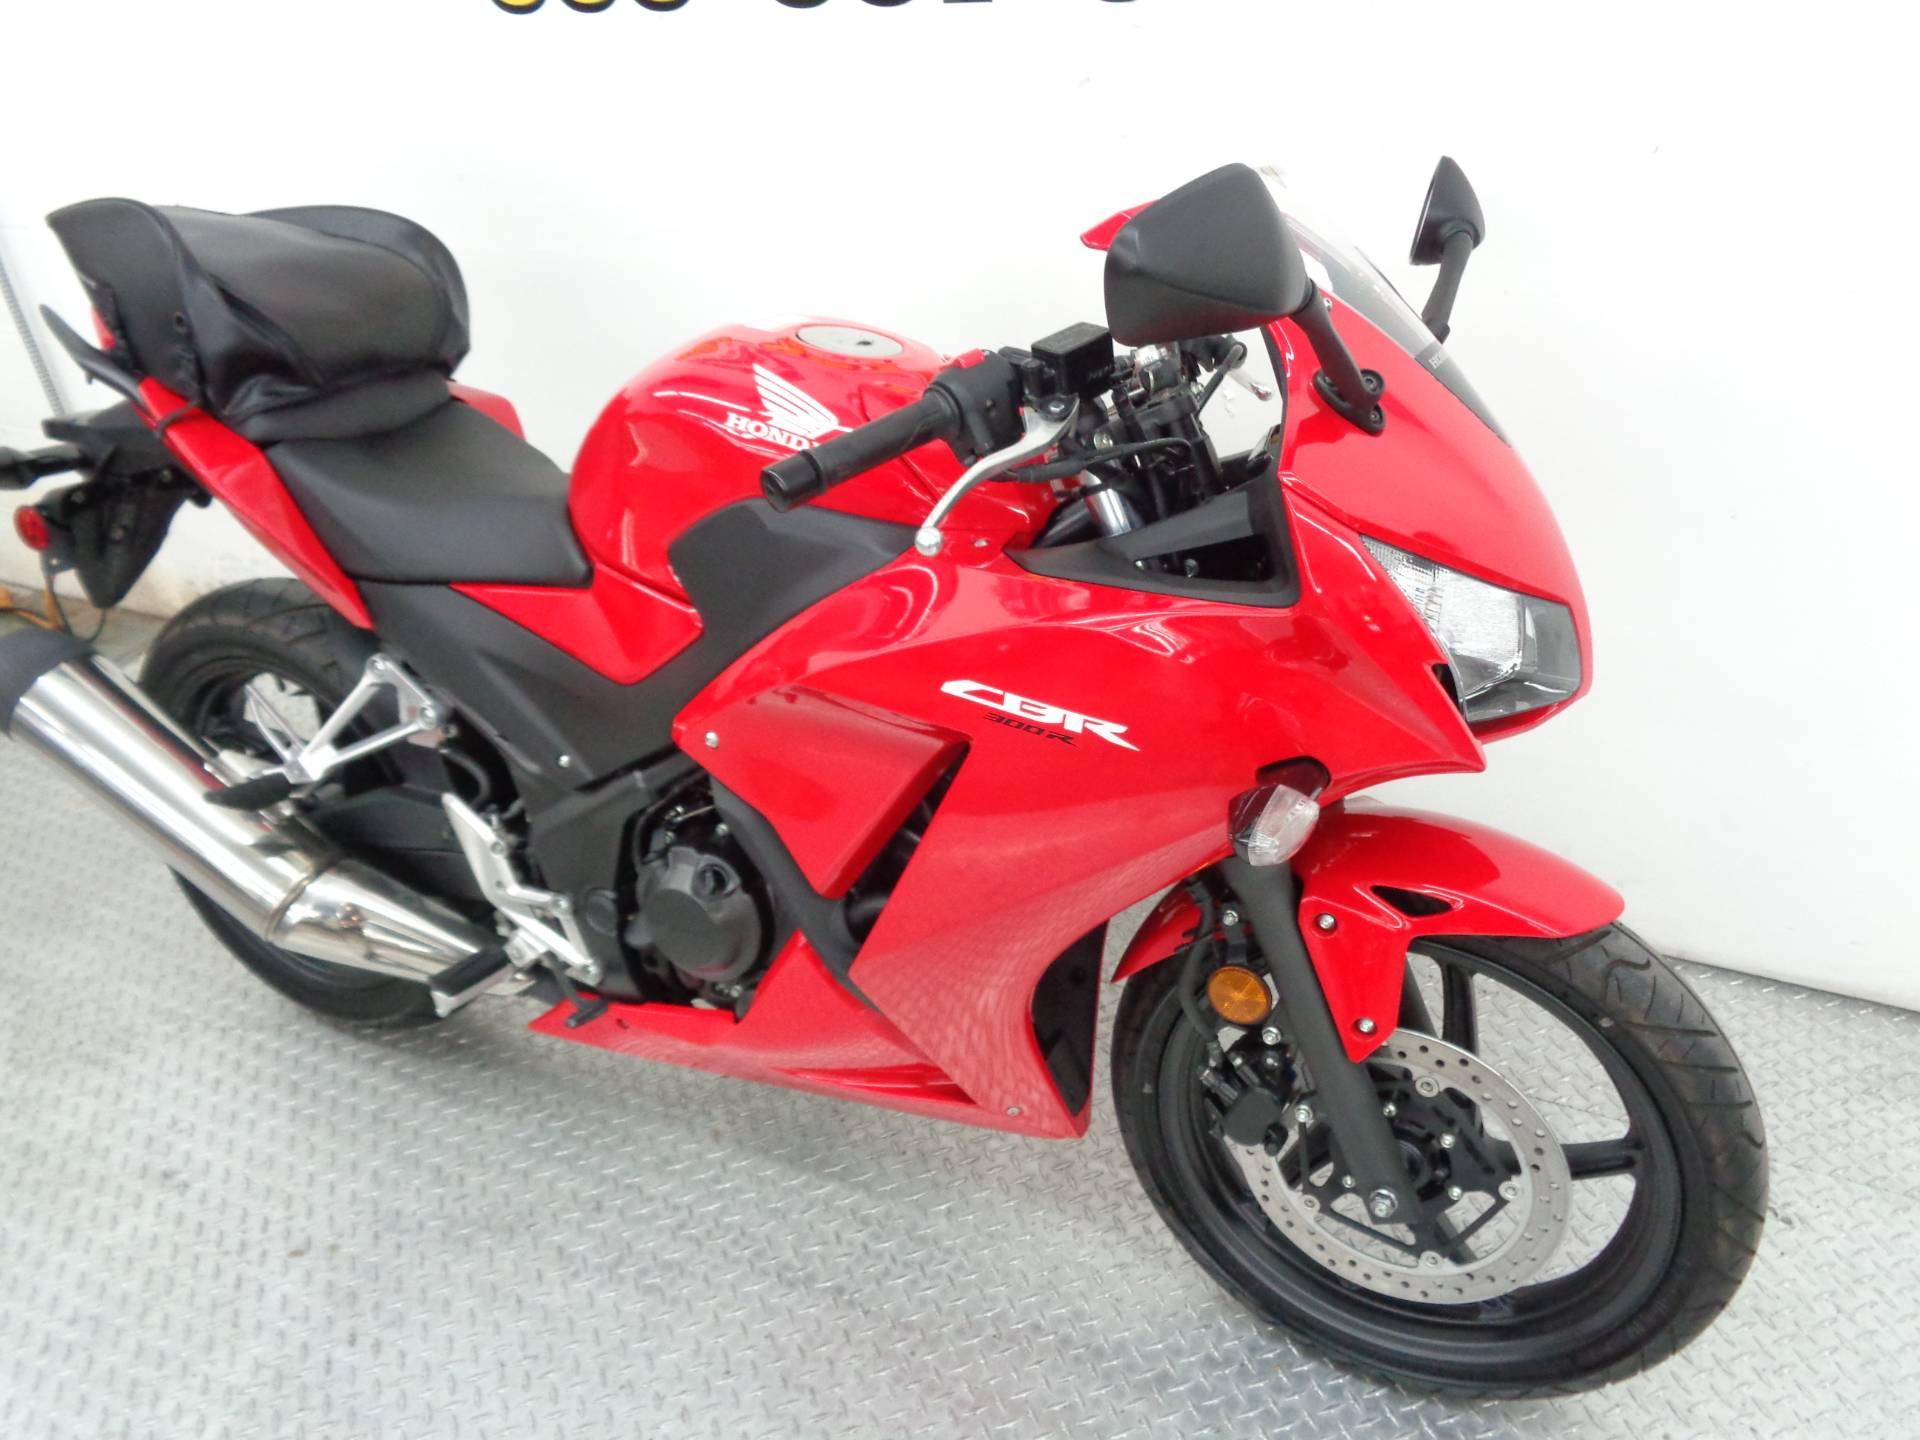 Honda Utvs For Sale Tulsa Ok >> 2015 Honda CBR300R For Sale Tulsa, OK : 26272